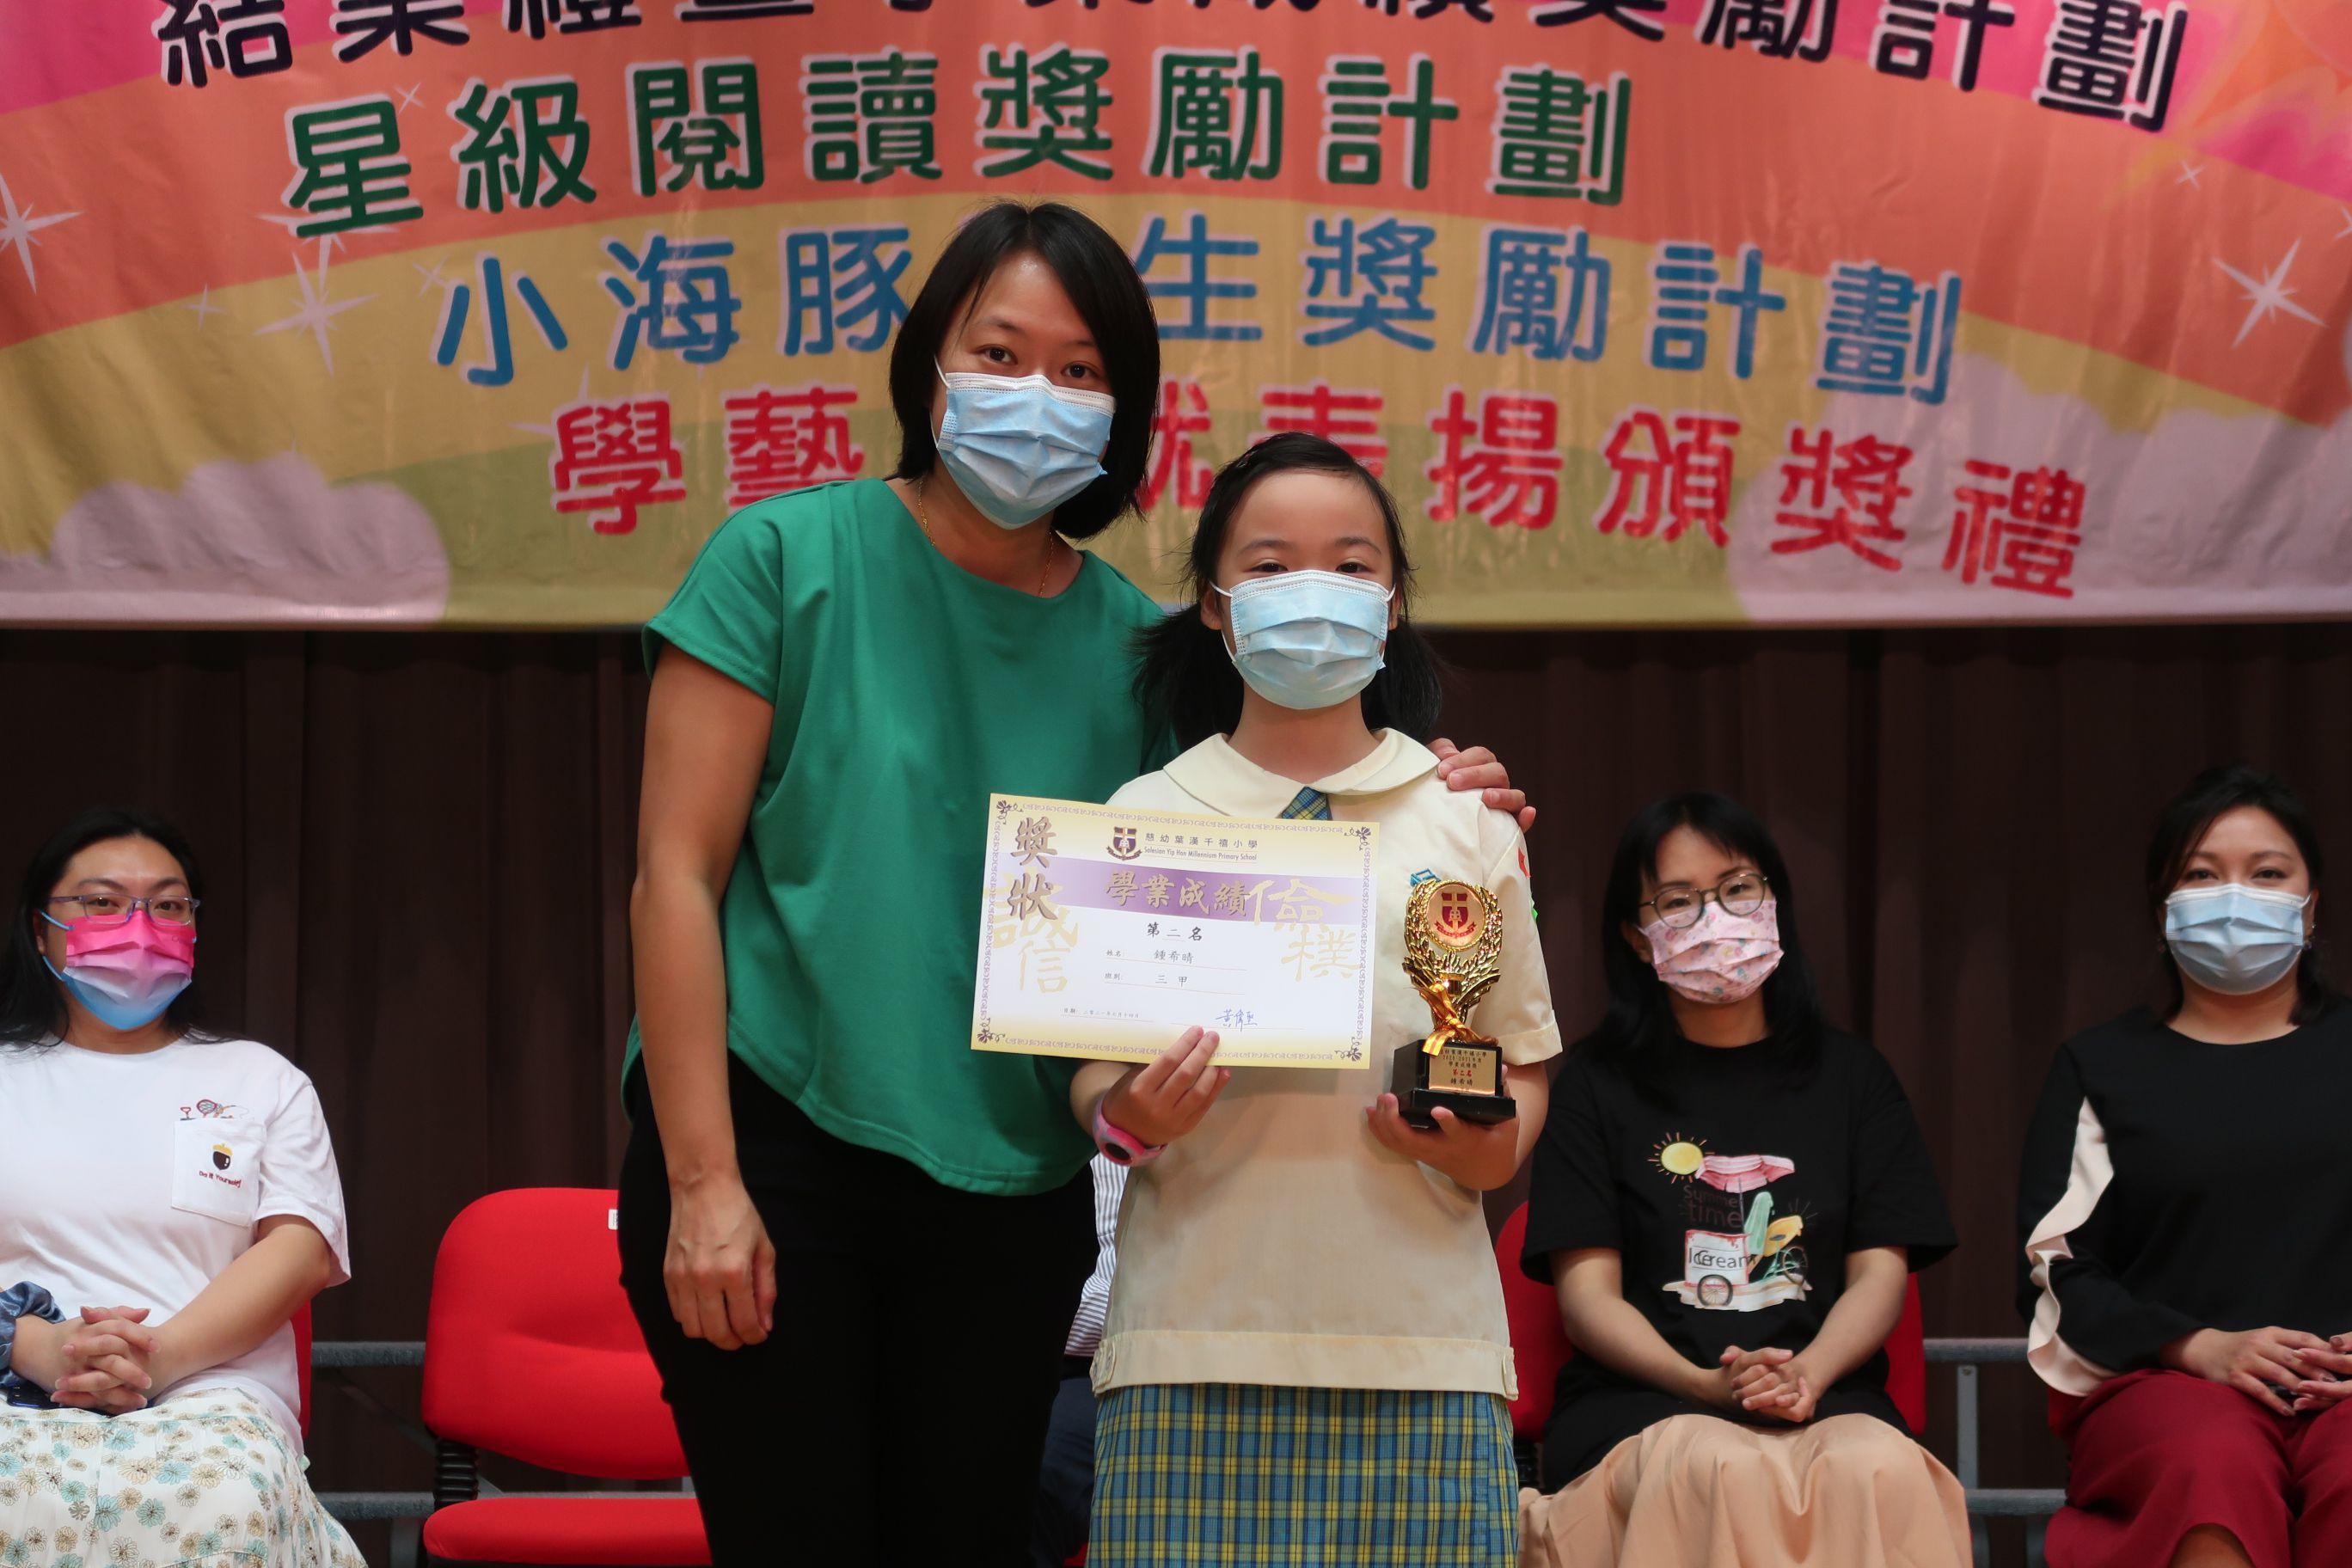 https://syh.edu.hk/sites/default/files/img_5430.jpg